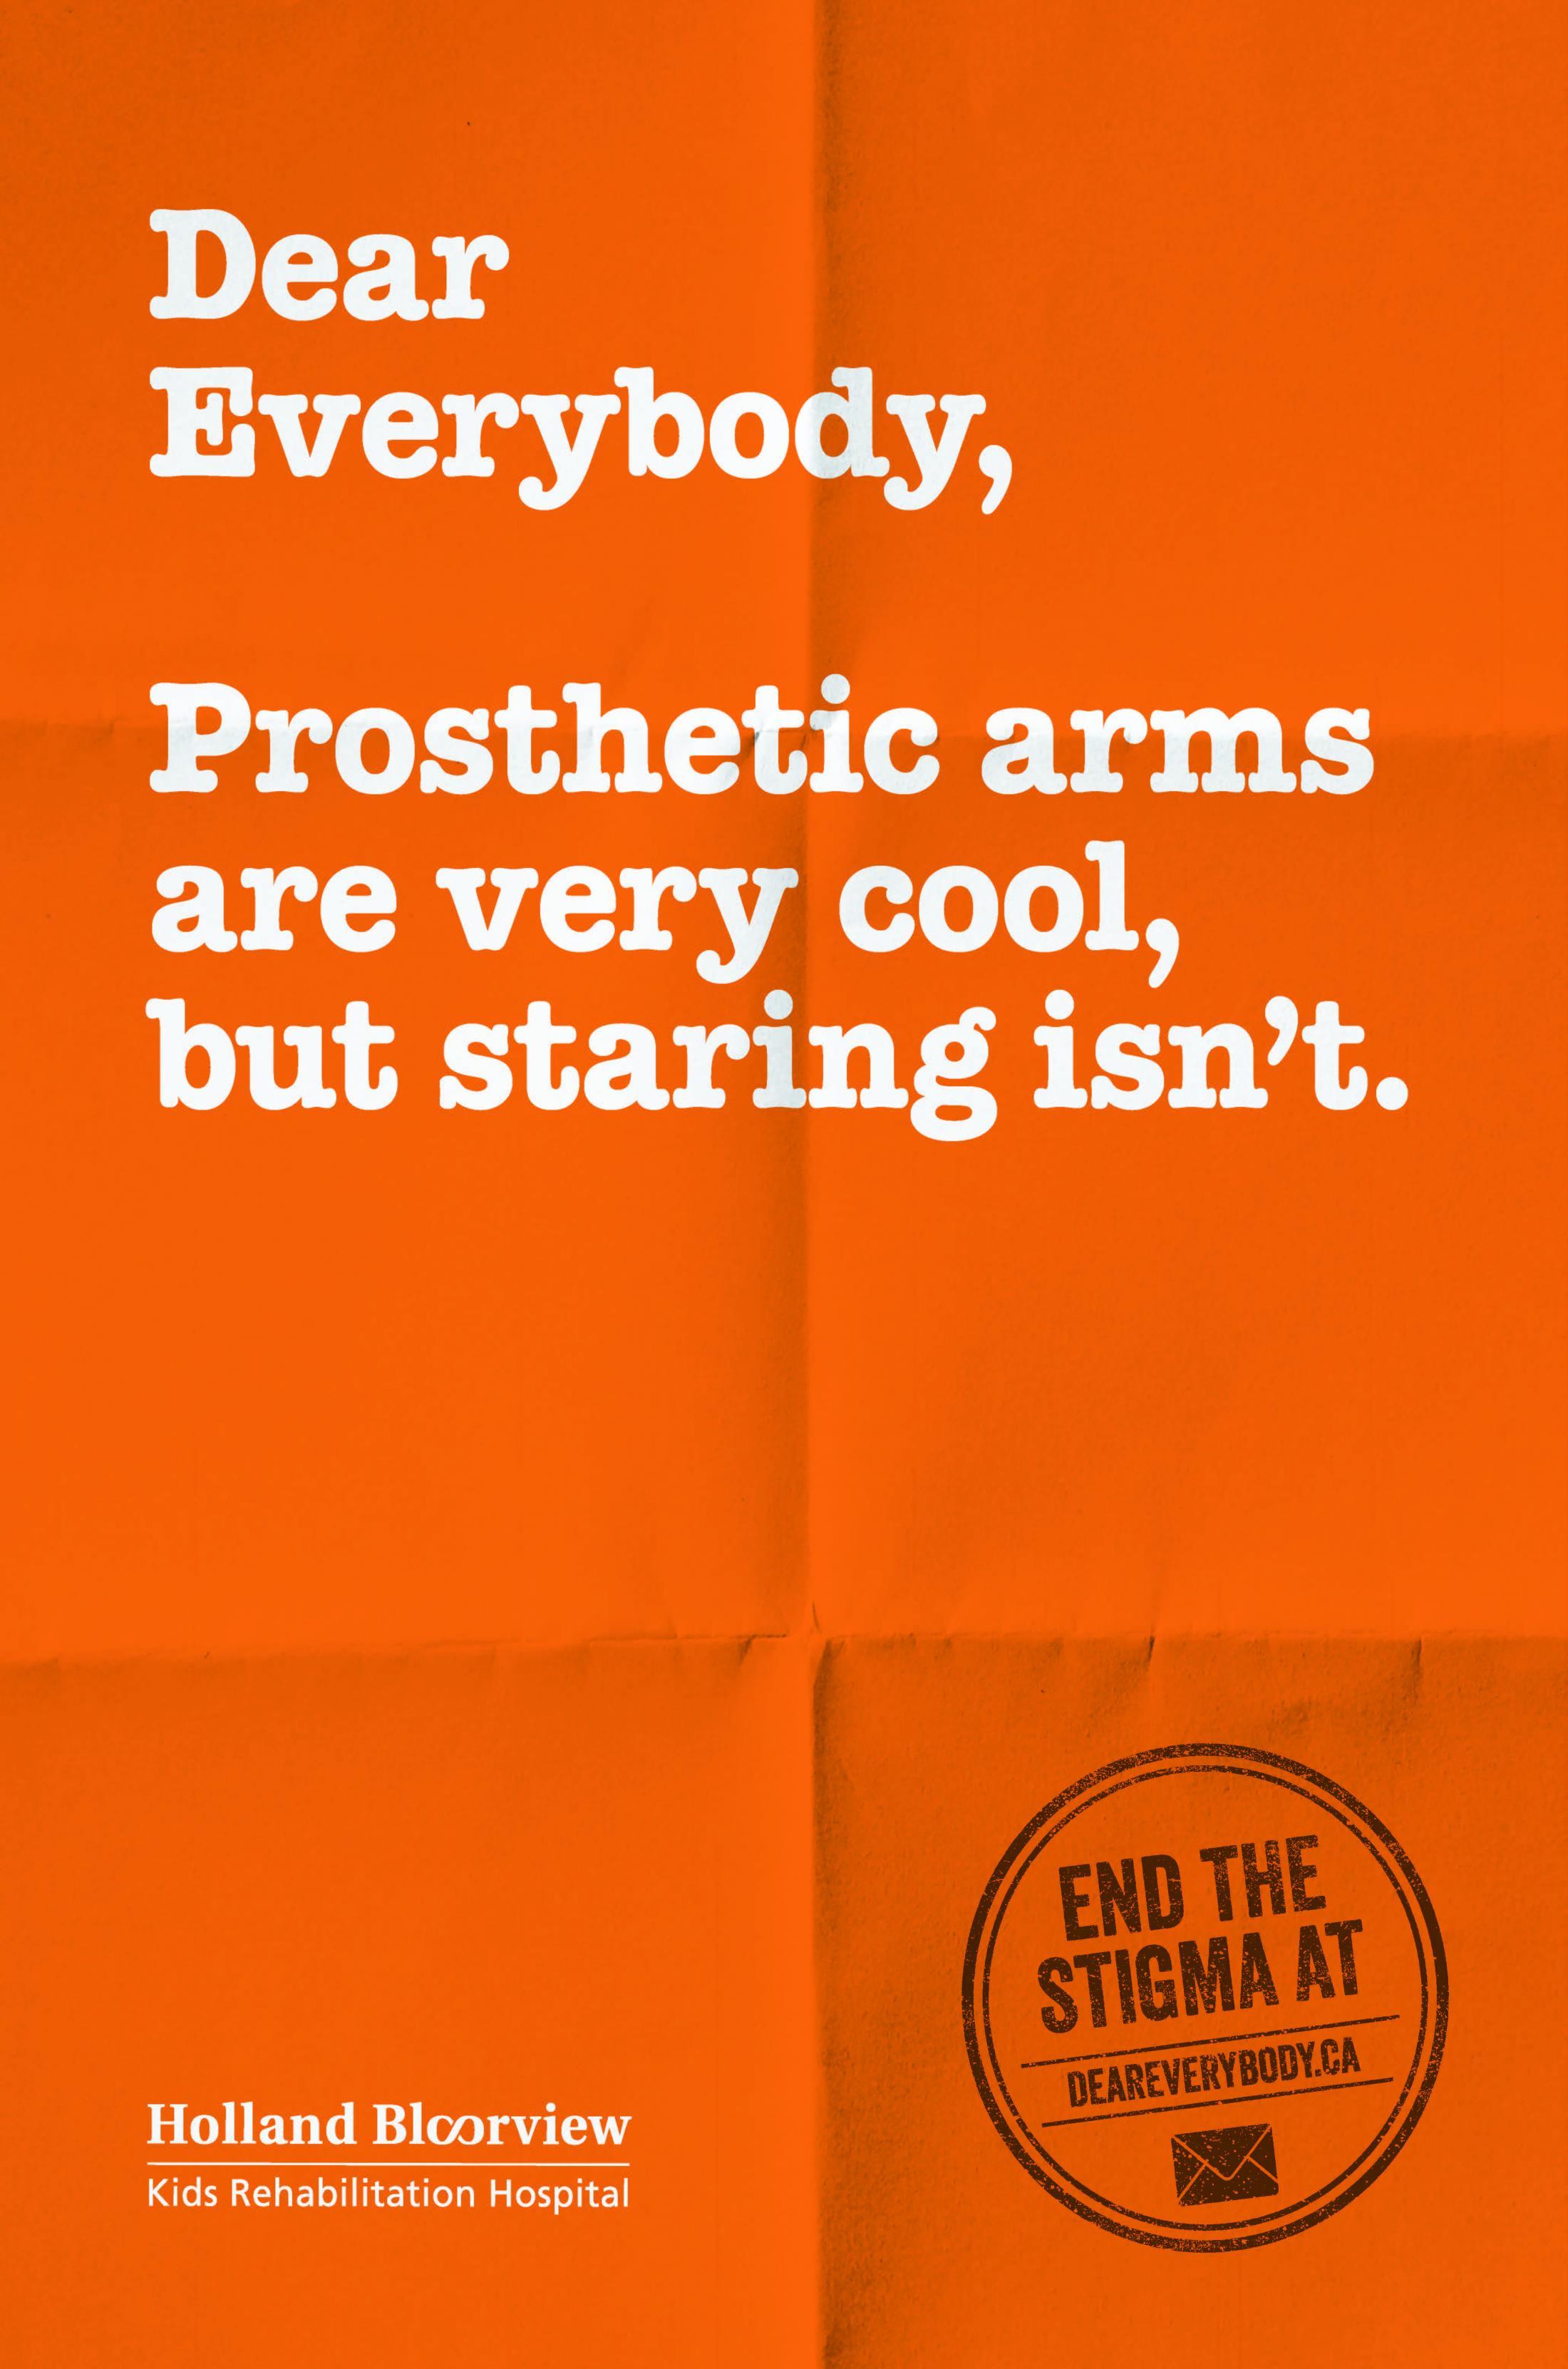 Holland Bloorview Kids Rehabilitation Outdoor Ad - Dear Everybody, 1